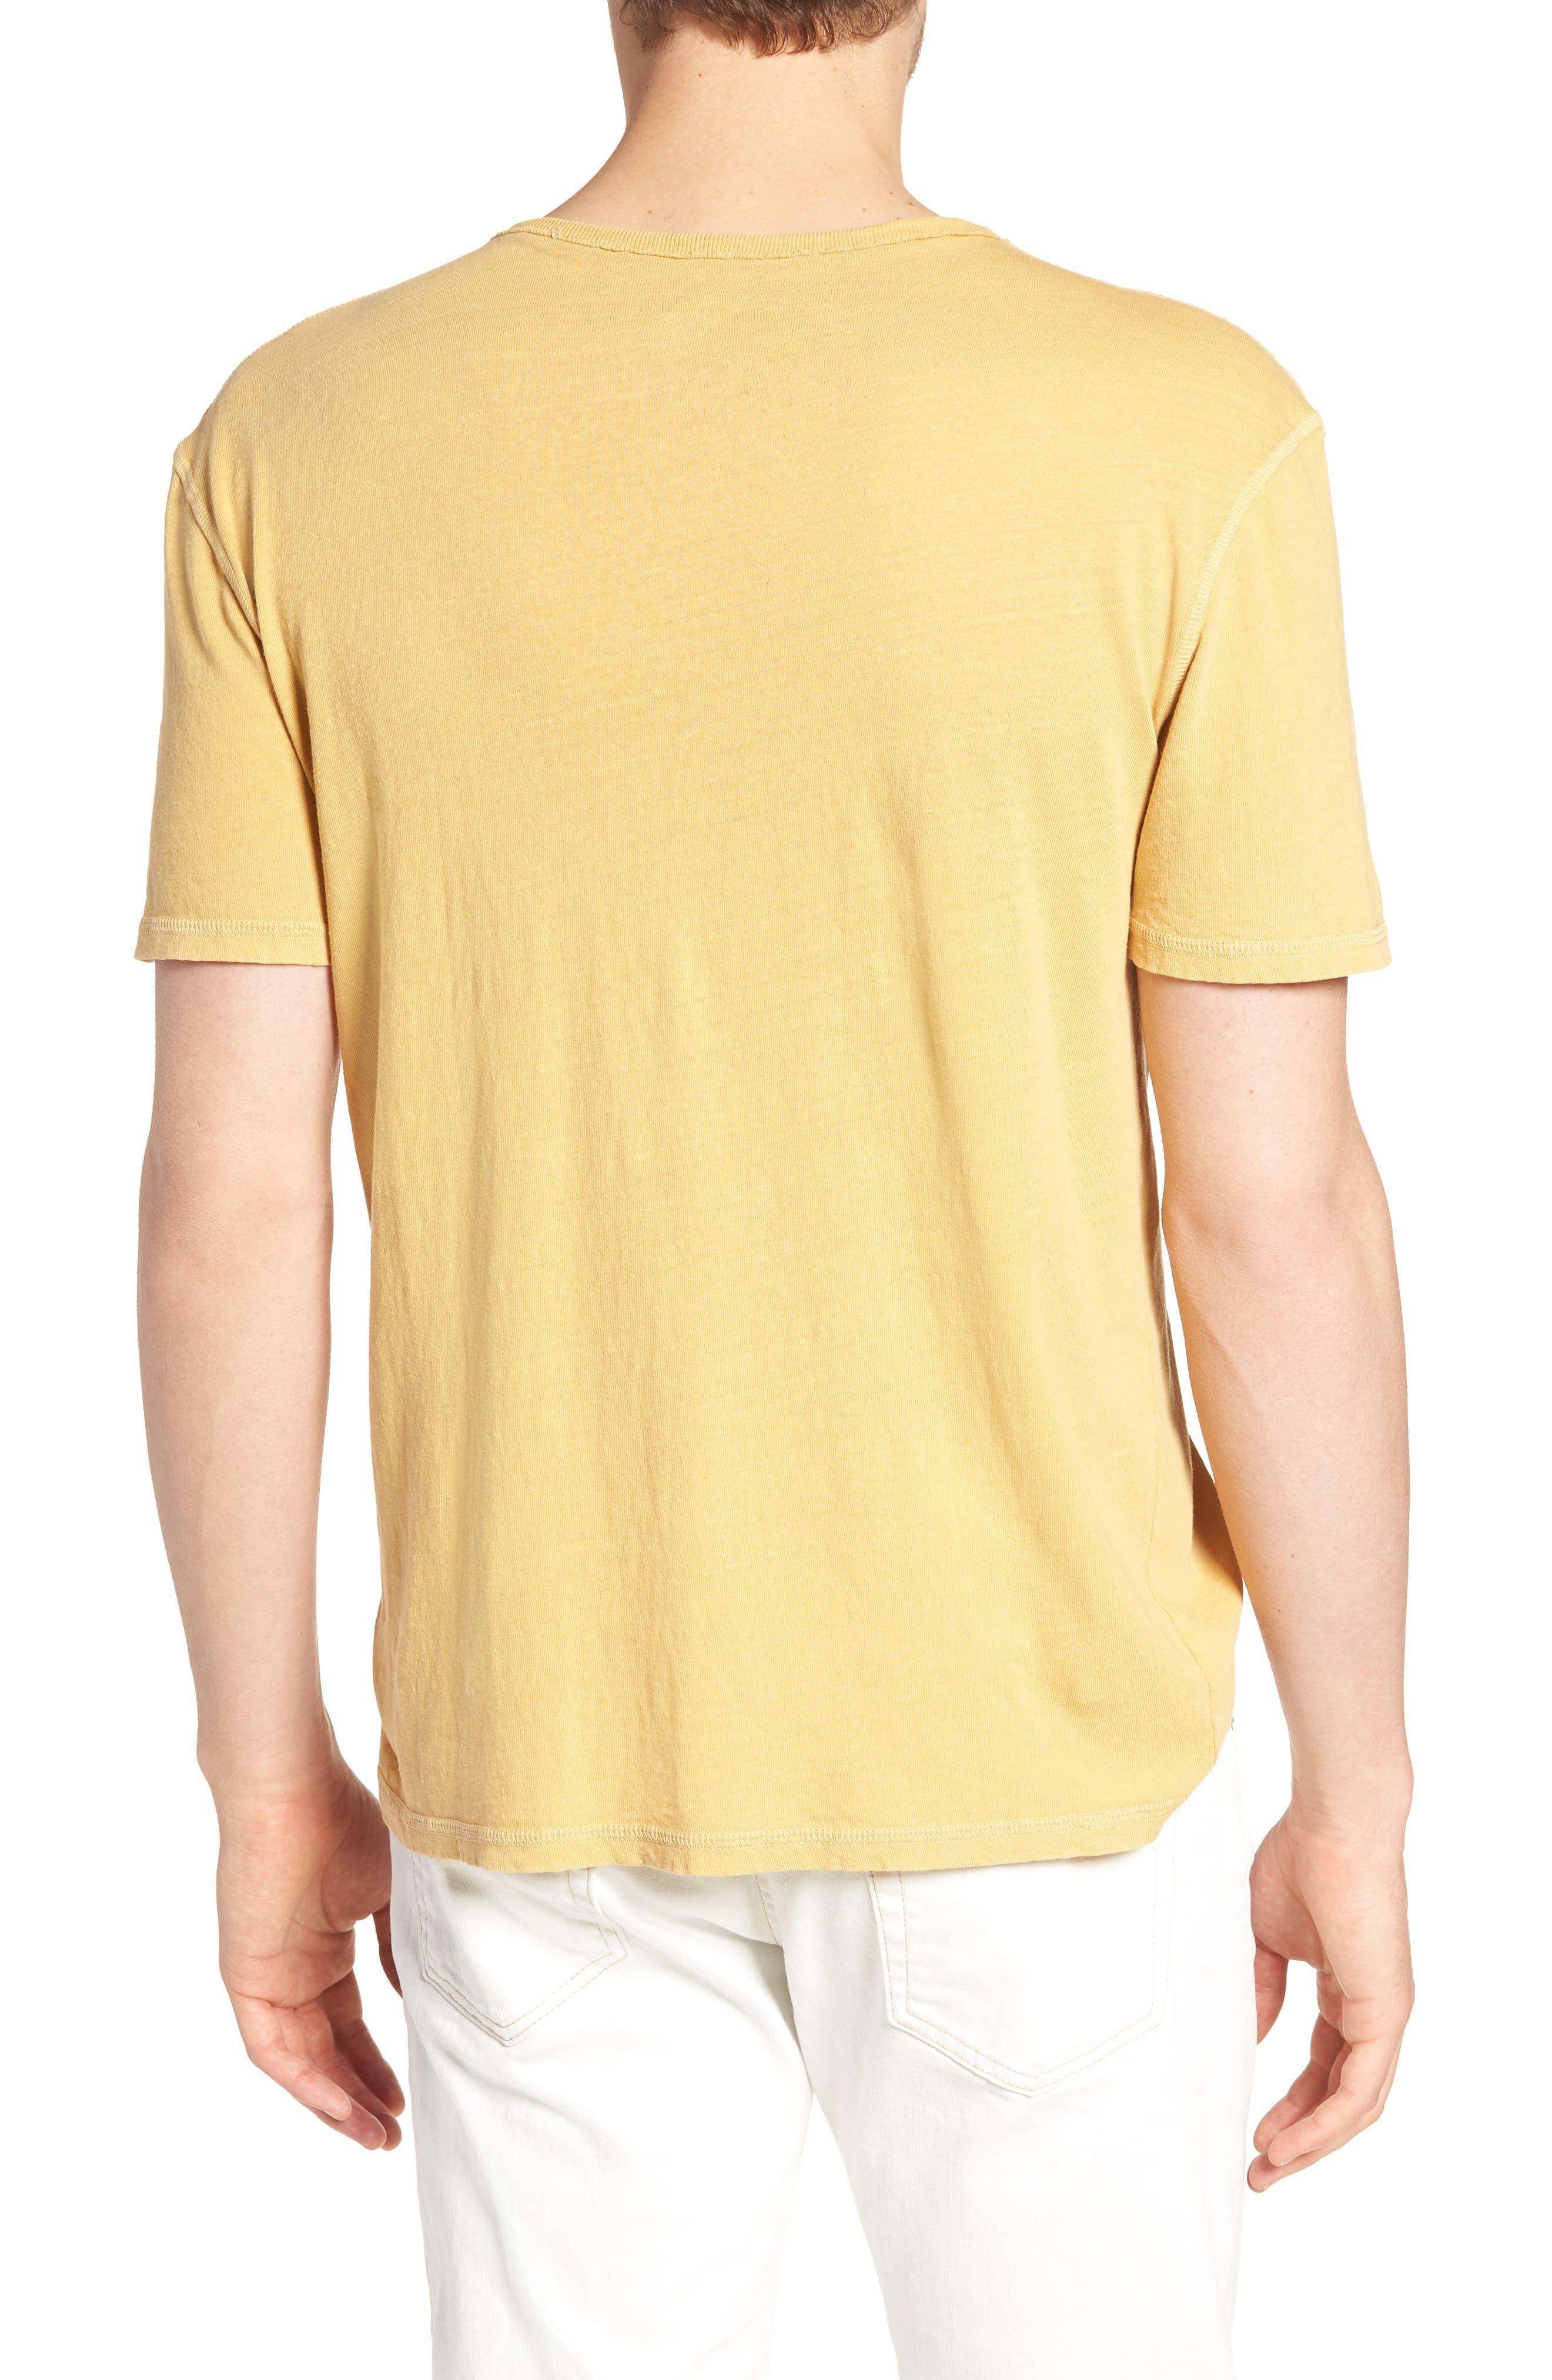 Ramsey Slim Fit Crewneck T-Shirt,                             Alternate thumbnail 2, color,                             Weathered Golden Emmer